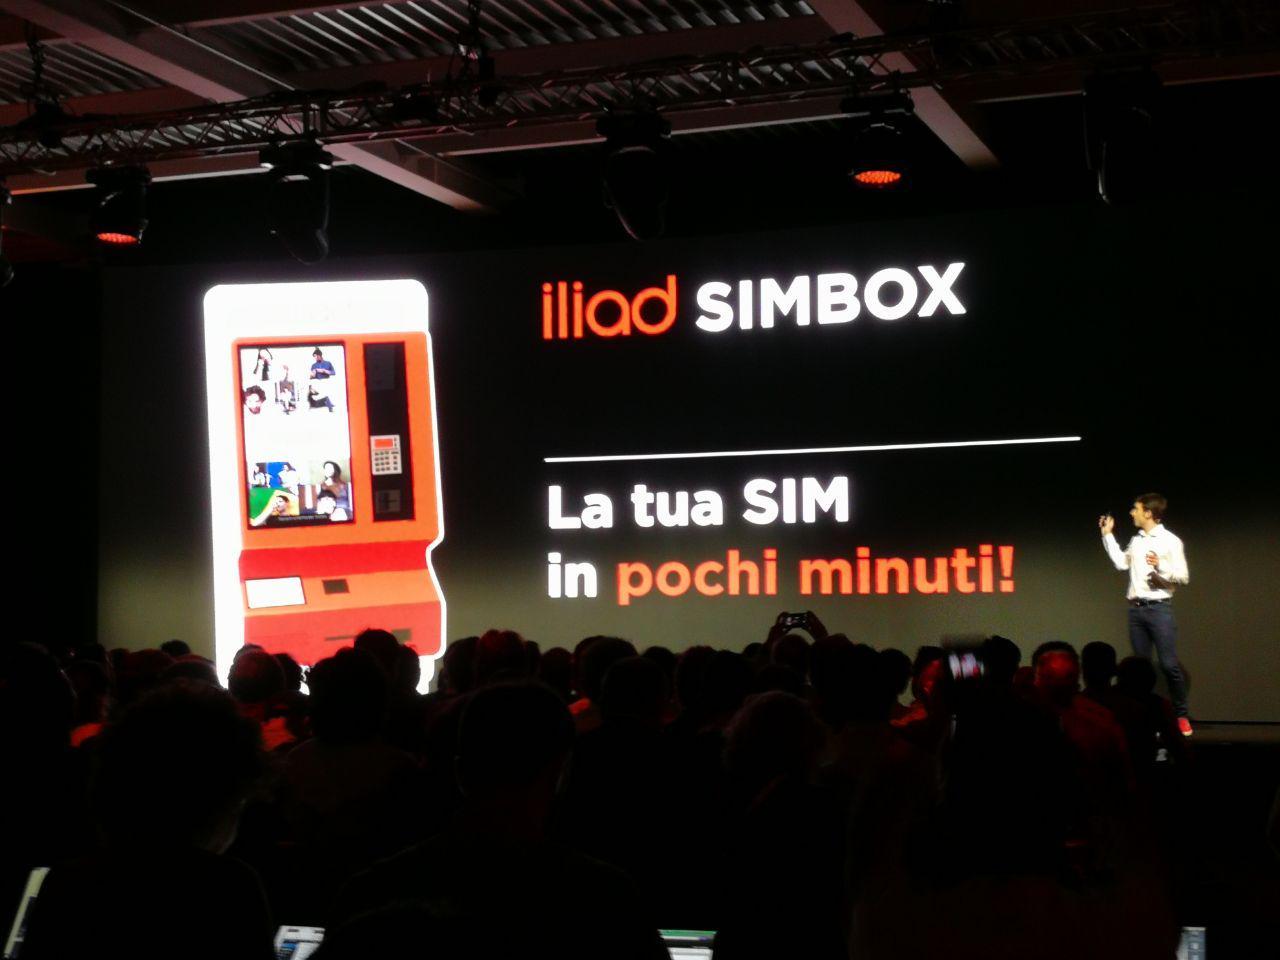 iliad simbox